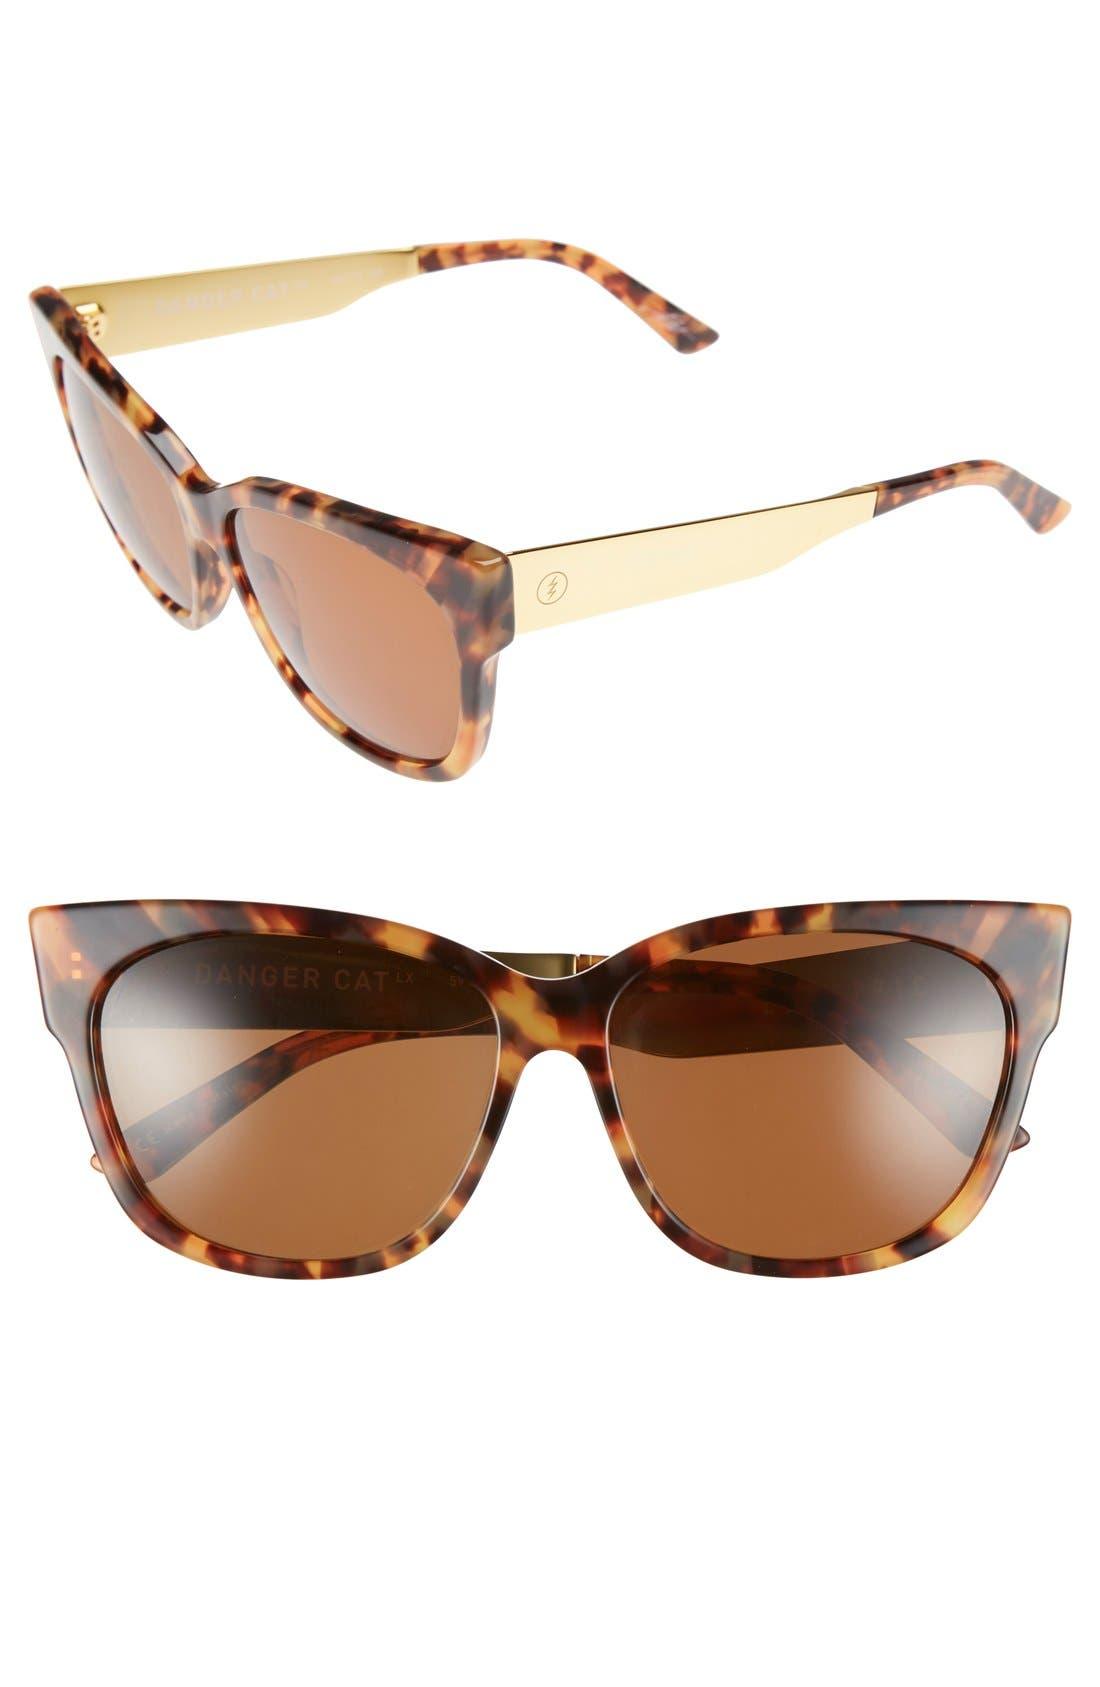 Alternate Image 1 Selected - ELECTRIC 'Danger Cat LX' 59mm Cat Eye Sunglasses